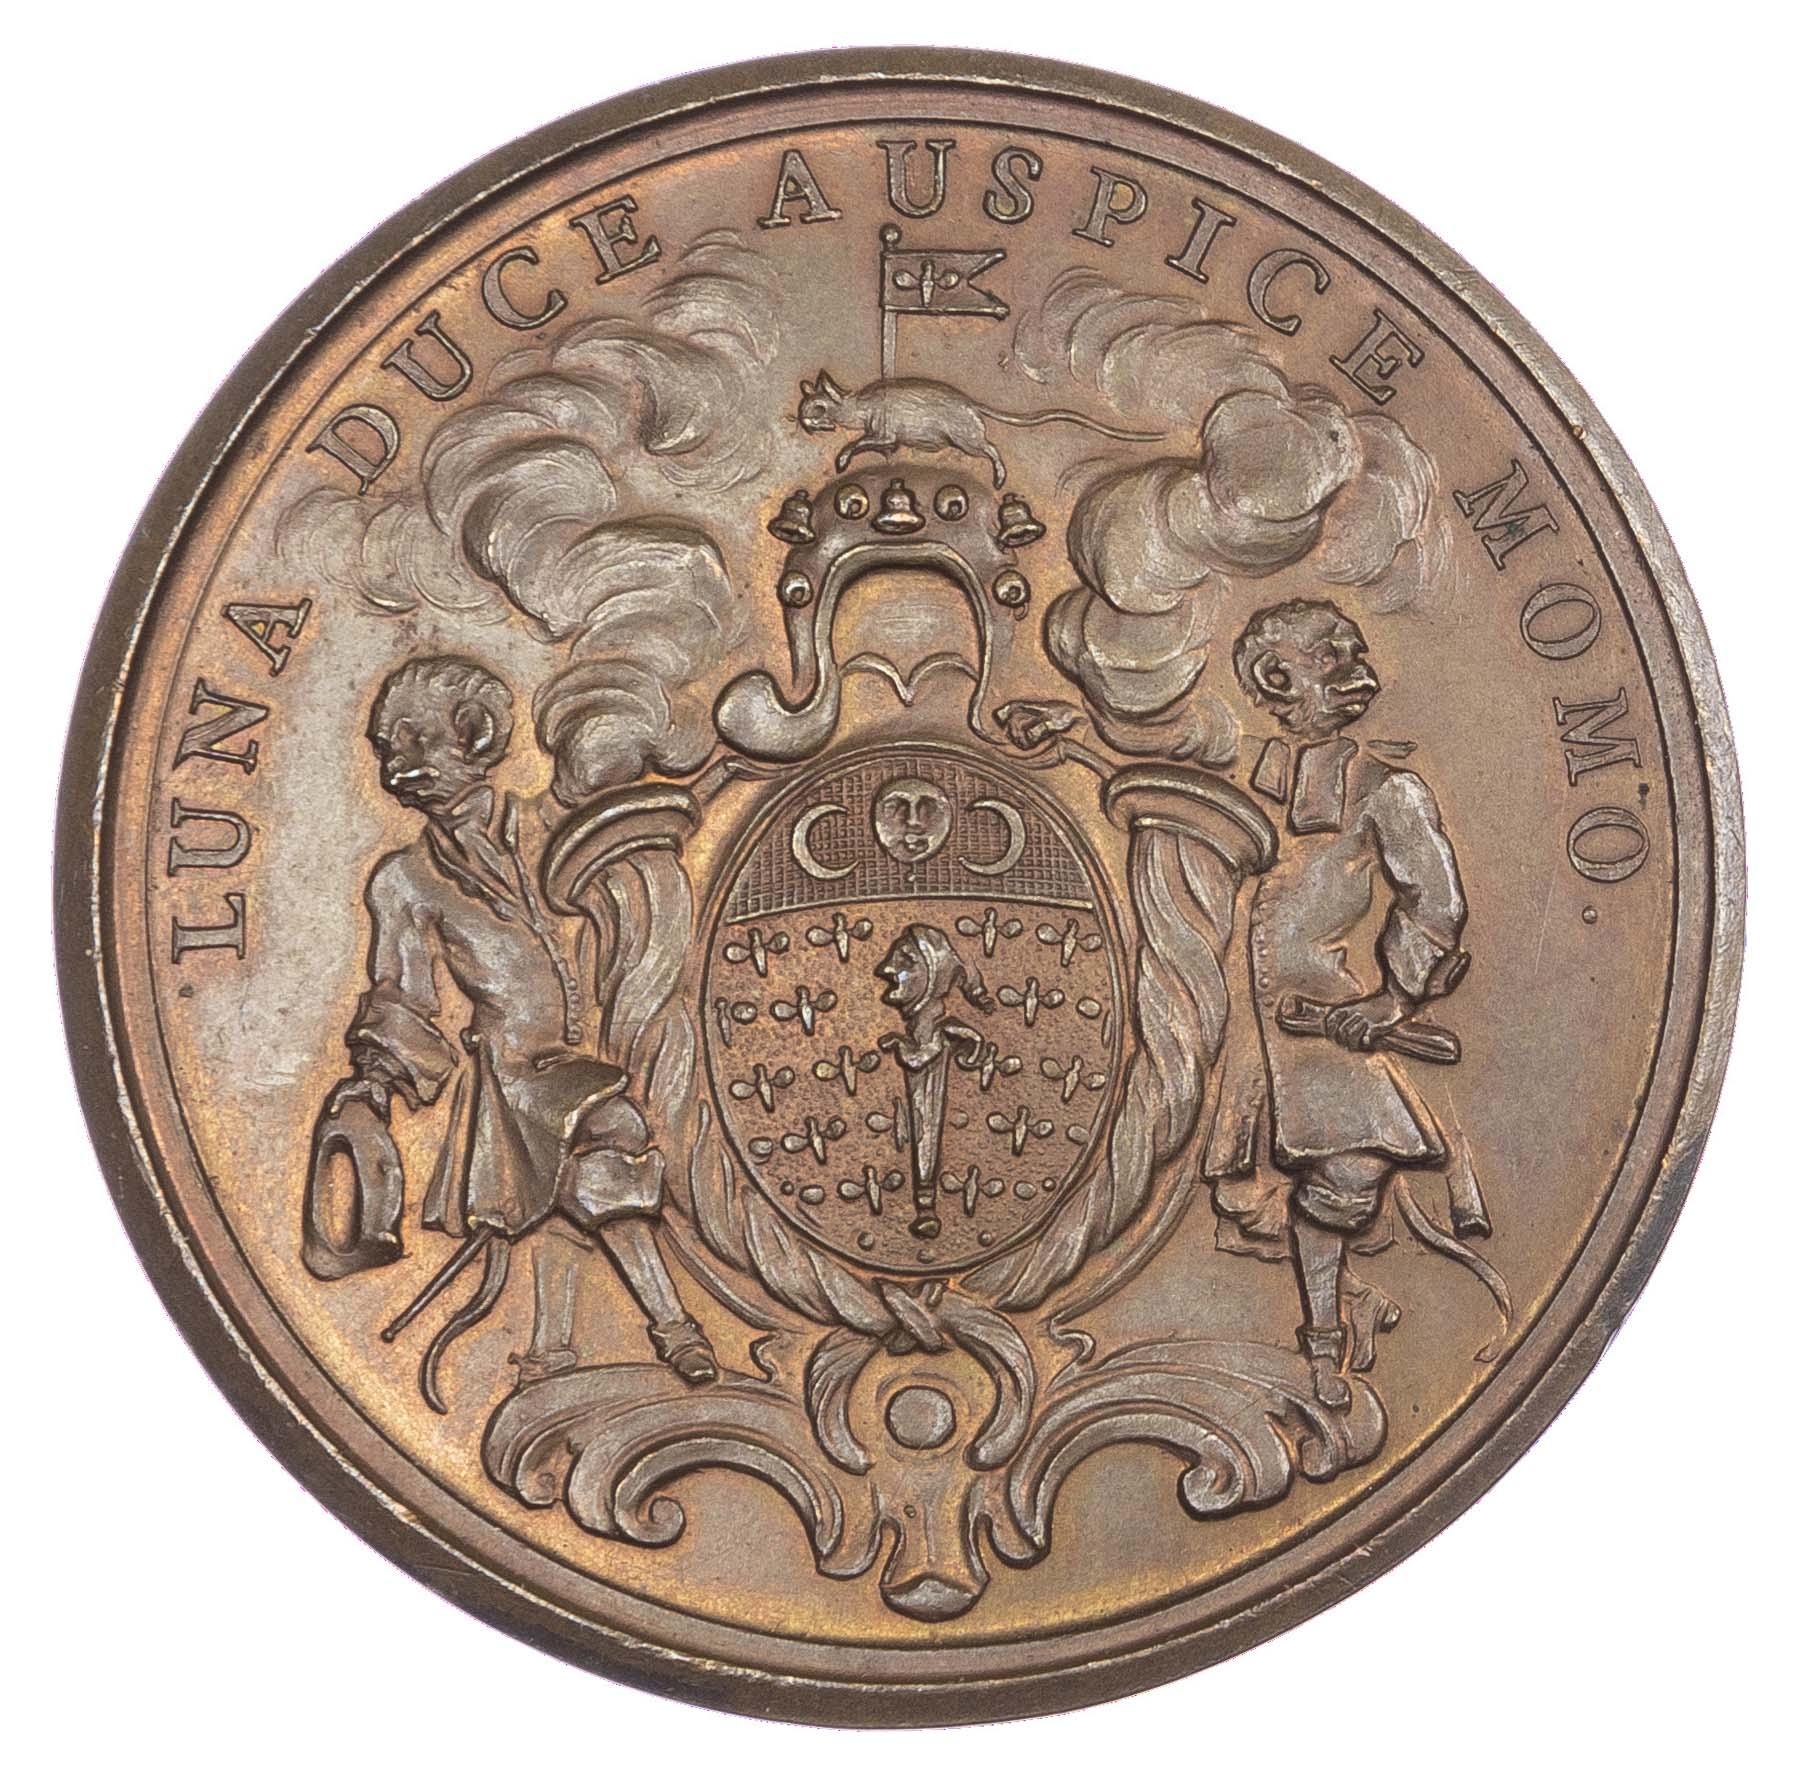 France/USA, Regiment de la Calotte/John Law's Mississippi Bubble, AE medal 1720